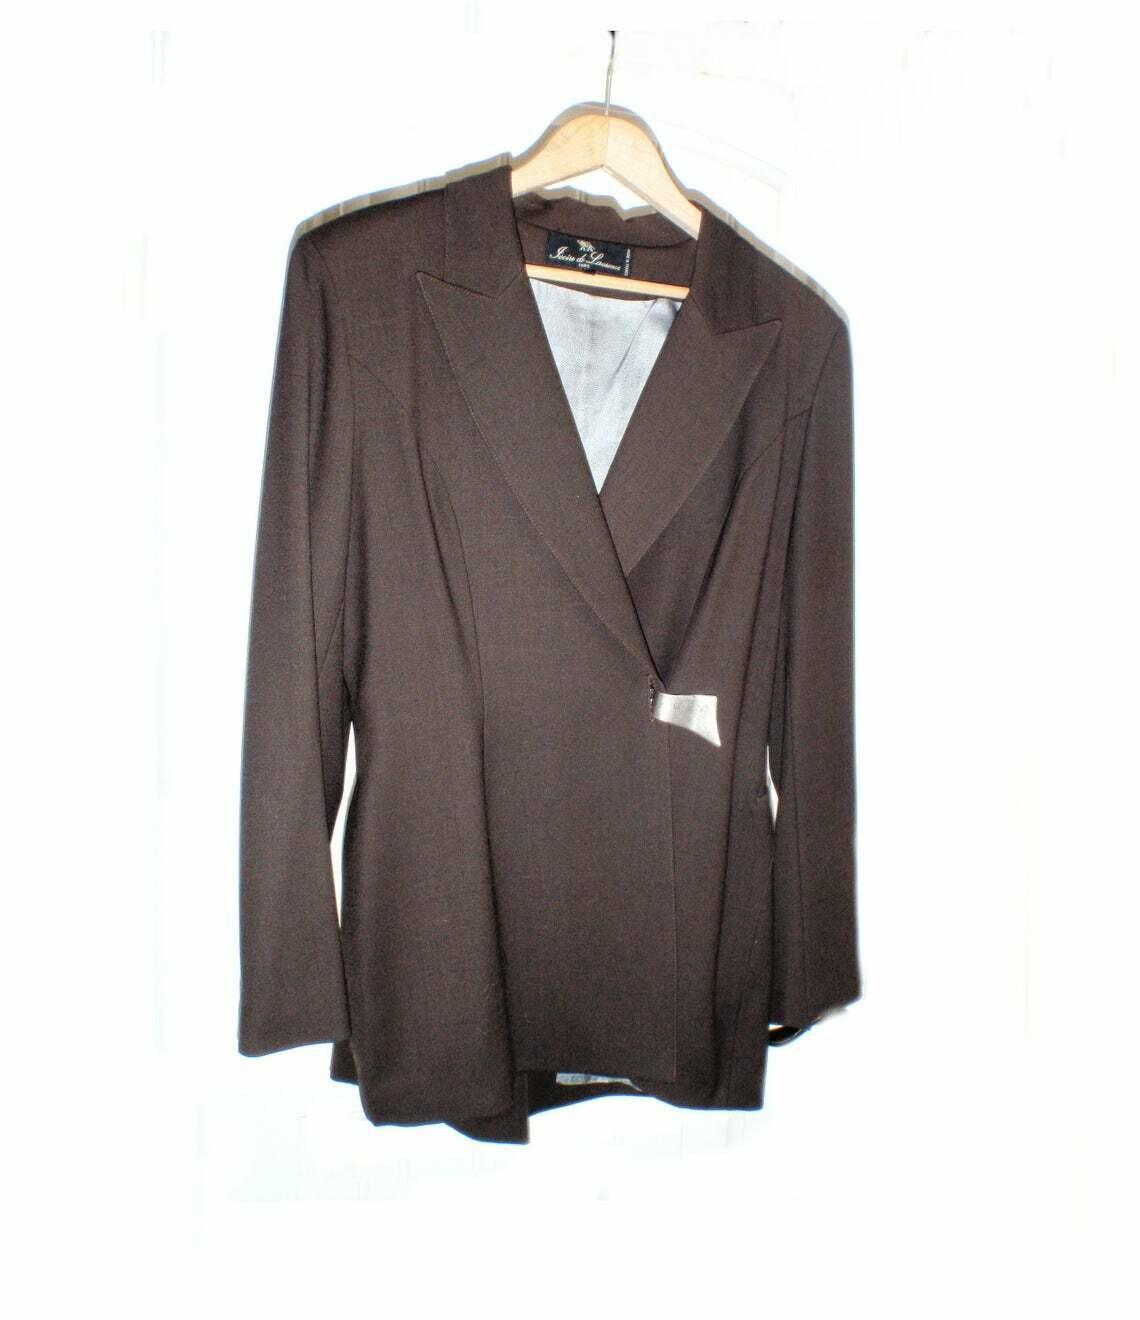 Ivoire de Laurence Wool Chocolate Brown Womens Pantsuit